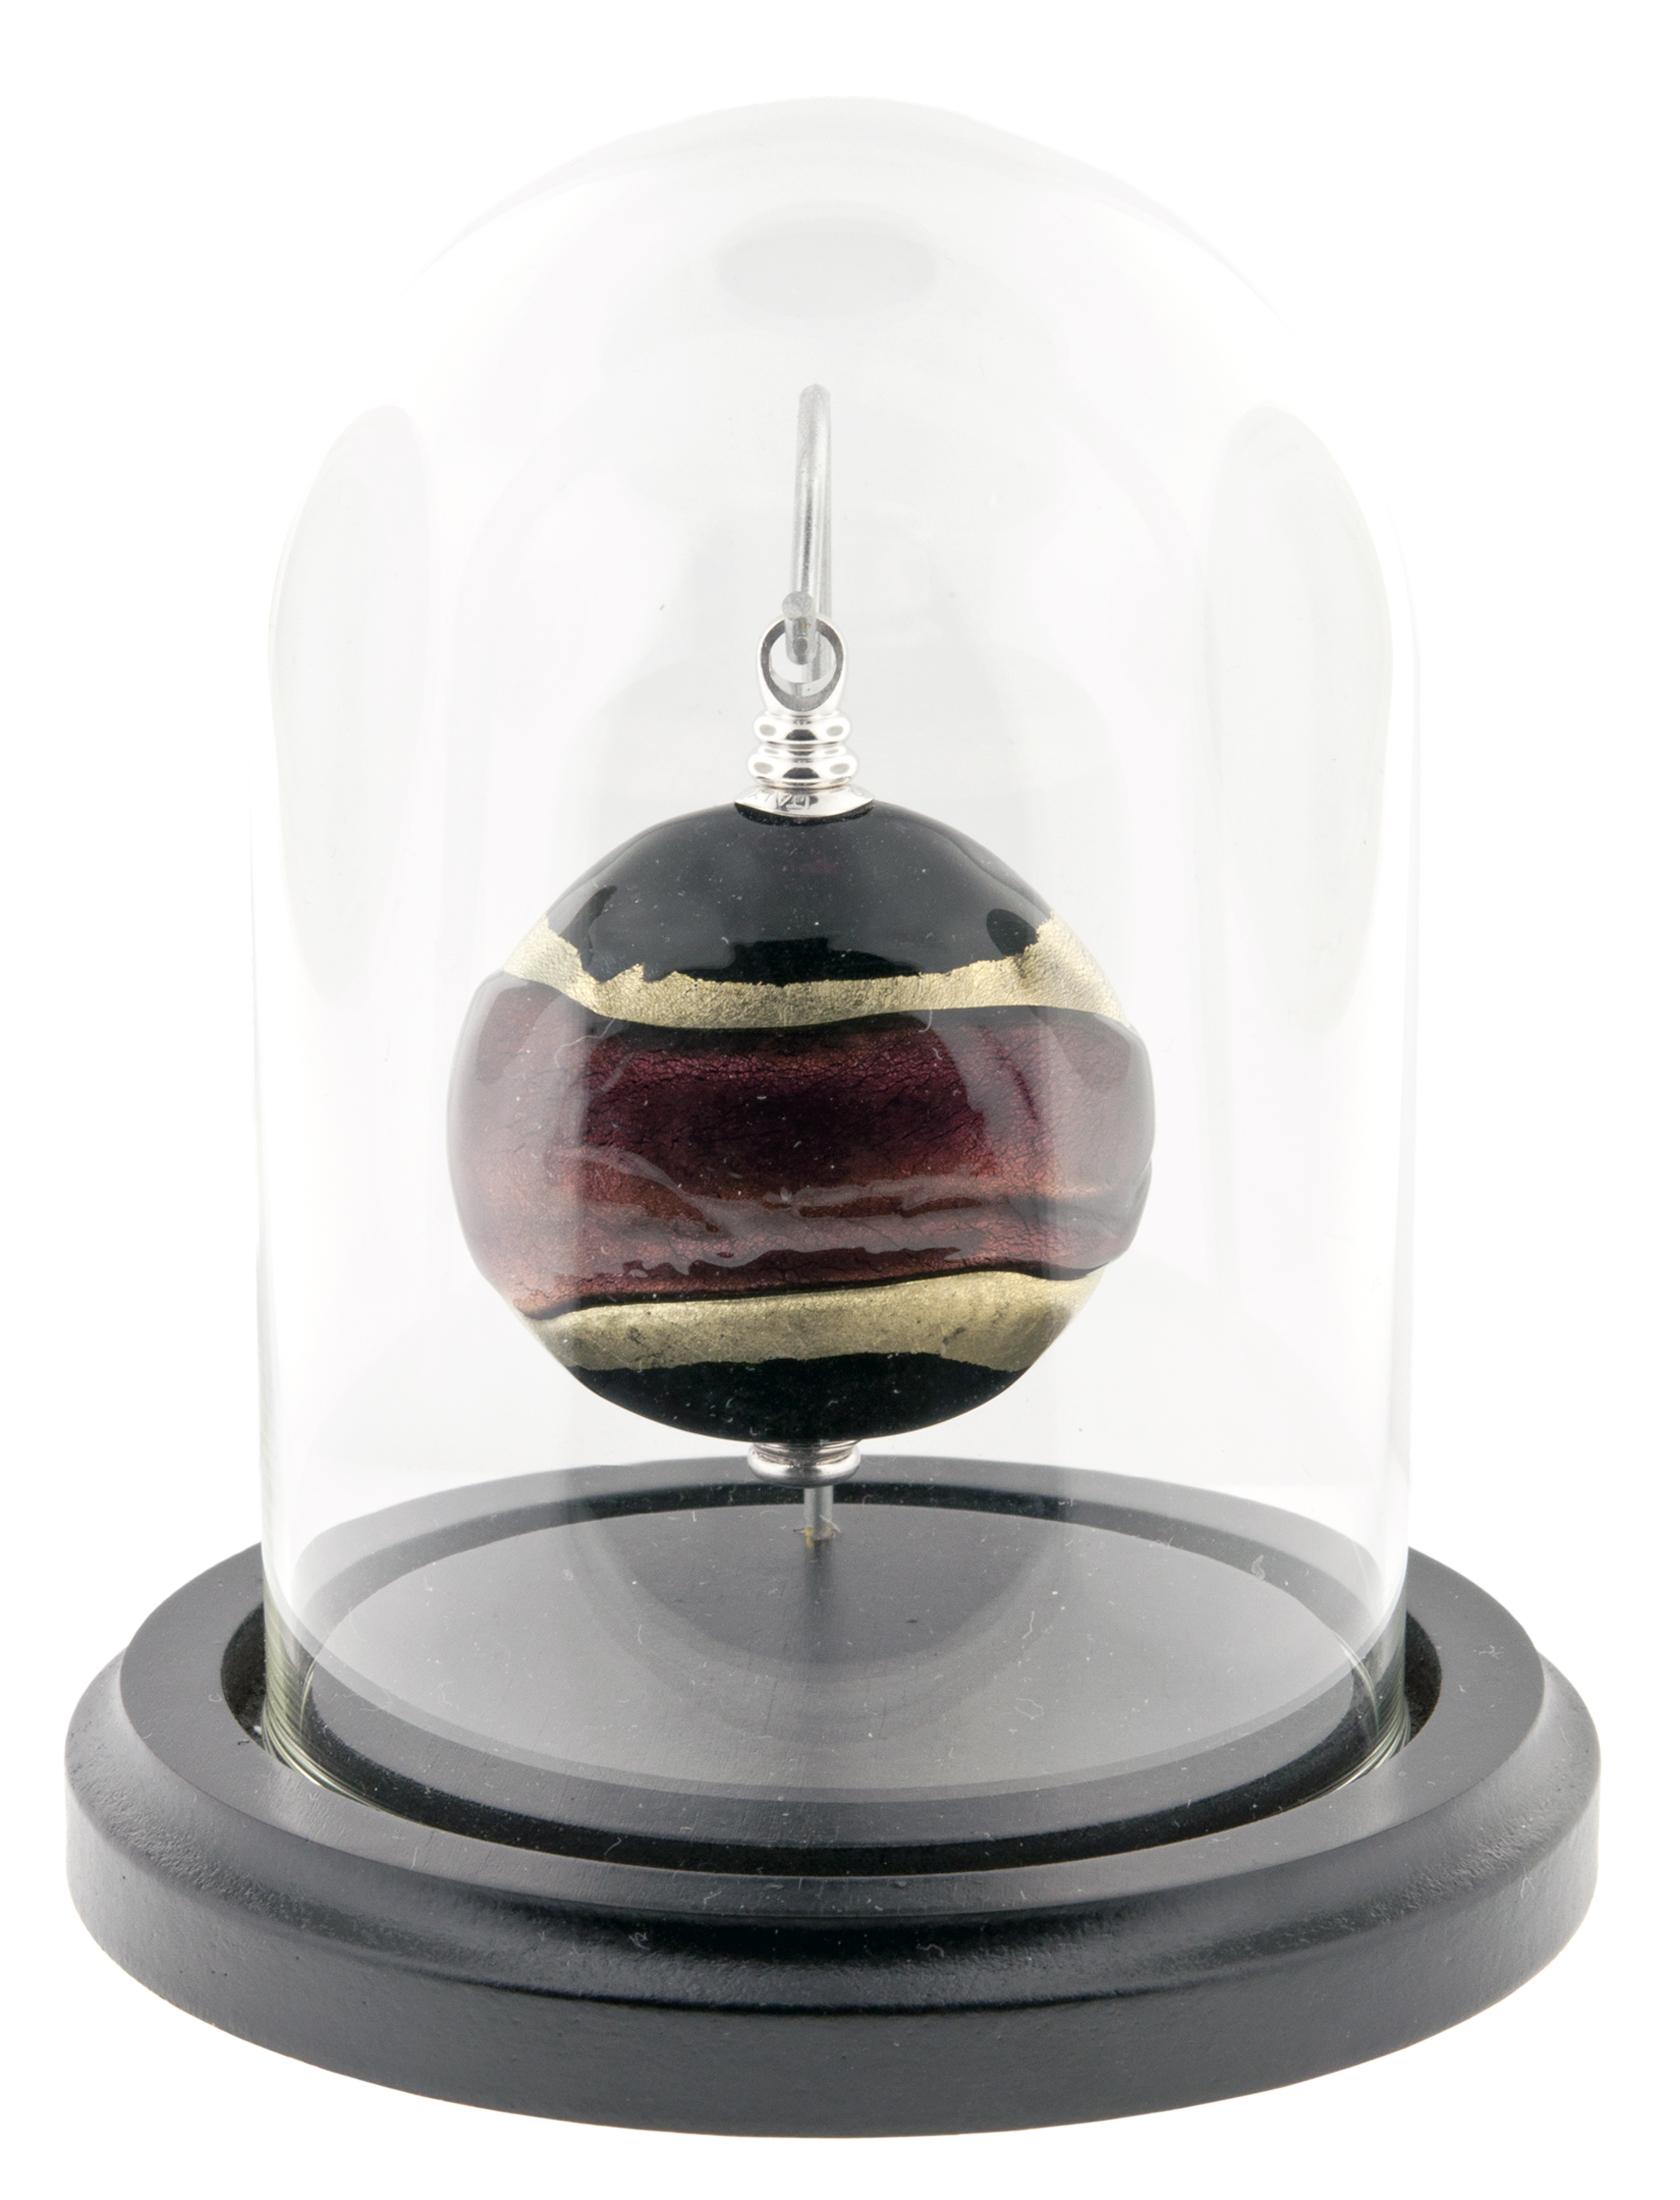 "Gilded Dreams Keepsake   Keepsake: 2"" W x 0.75"" D x 2.3"" H / 0.5 CI  Base and Glass Dome (included): 4"" Dia x 5"" H   $425"